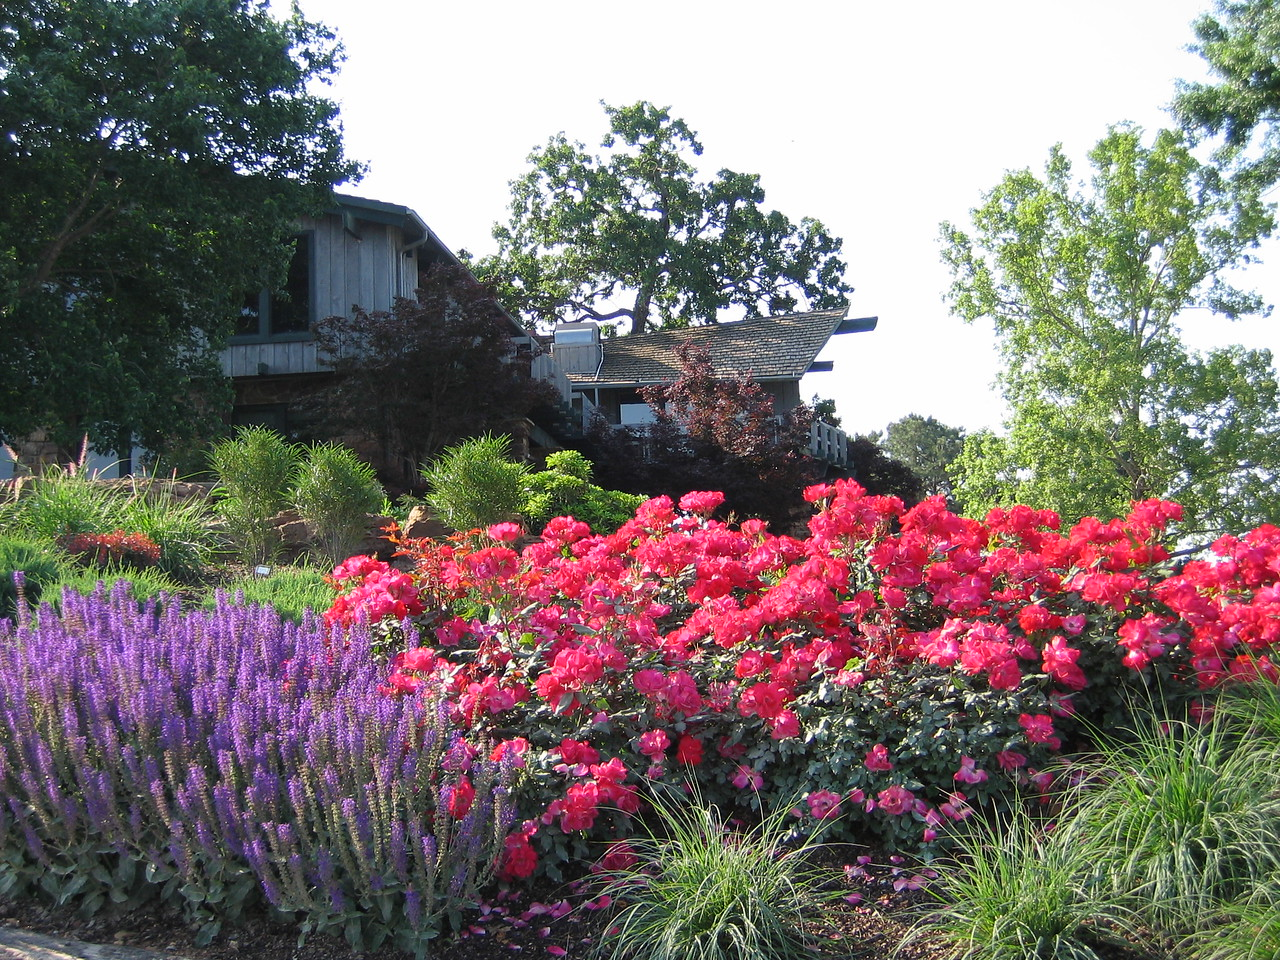 Knock Out® Rose PP11836 http://www.greenleafnursery.com/index.cfm/fuseaction/plants.plantDetail/plant_id/3751/index.htm